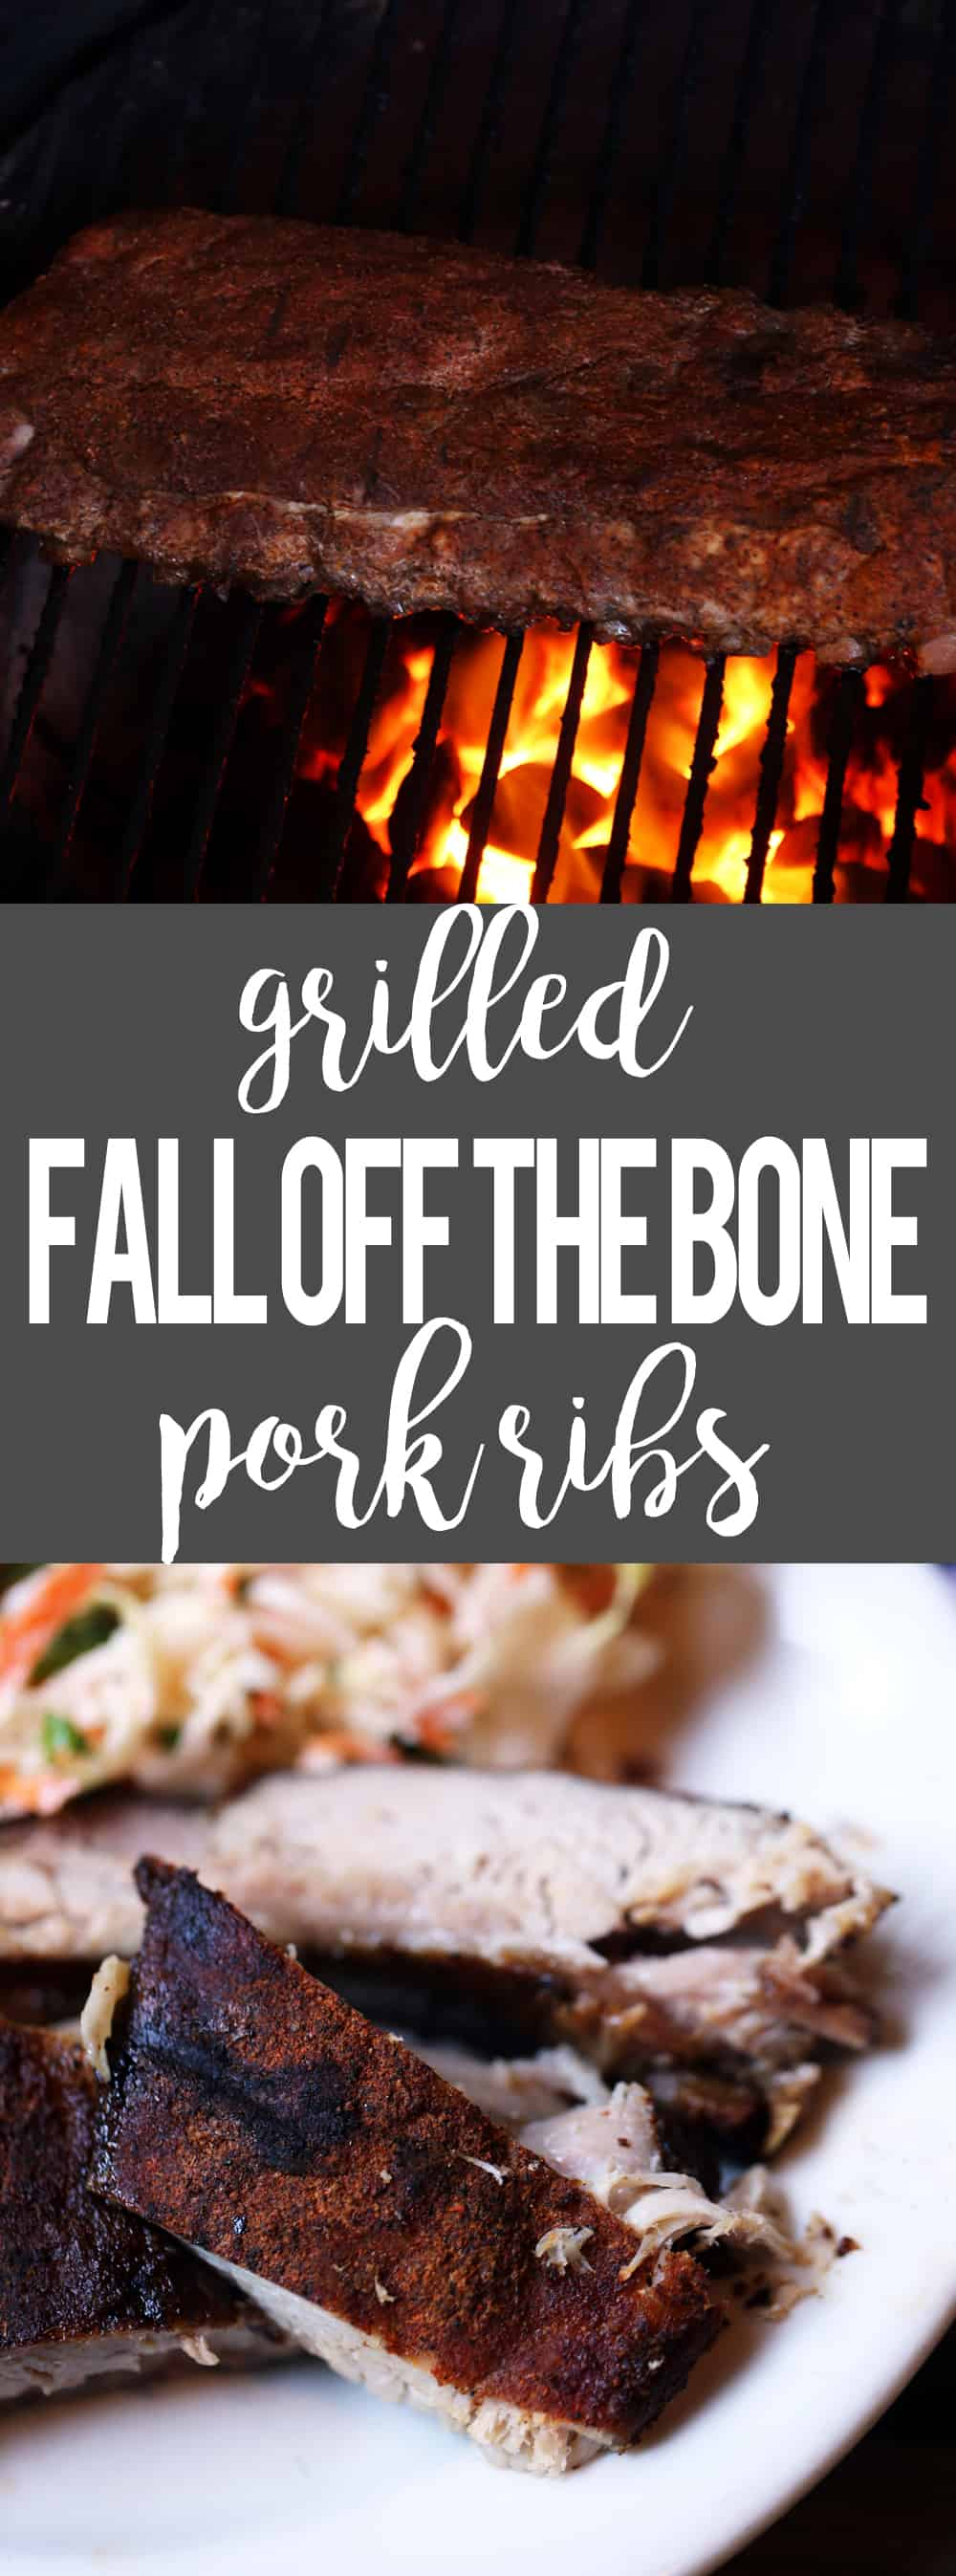 Grilled Fall Off the Bone Pork Ribs